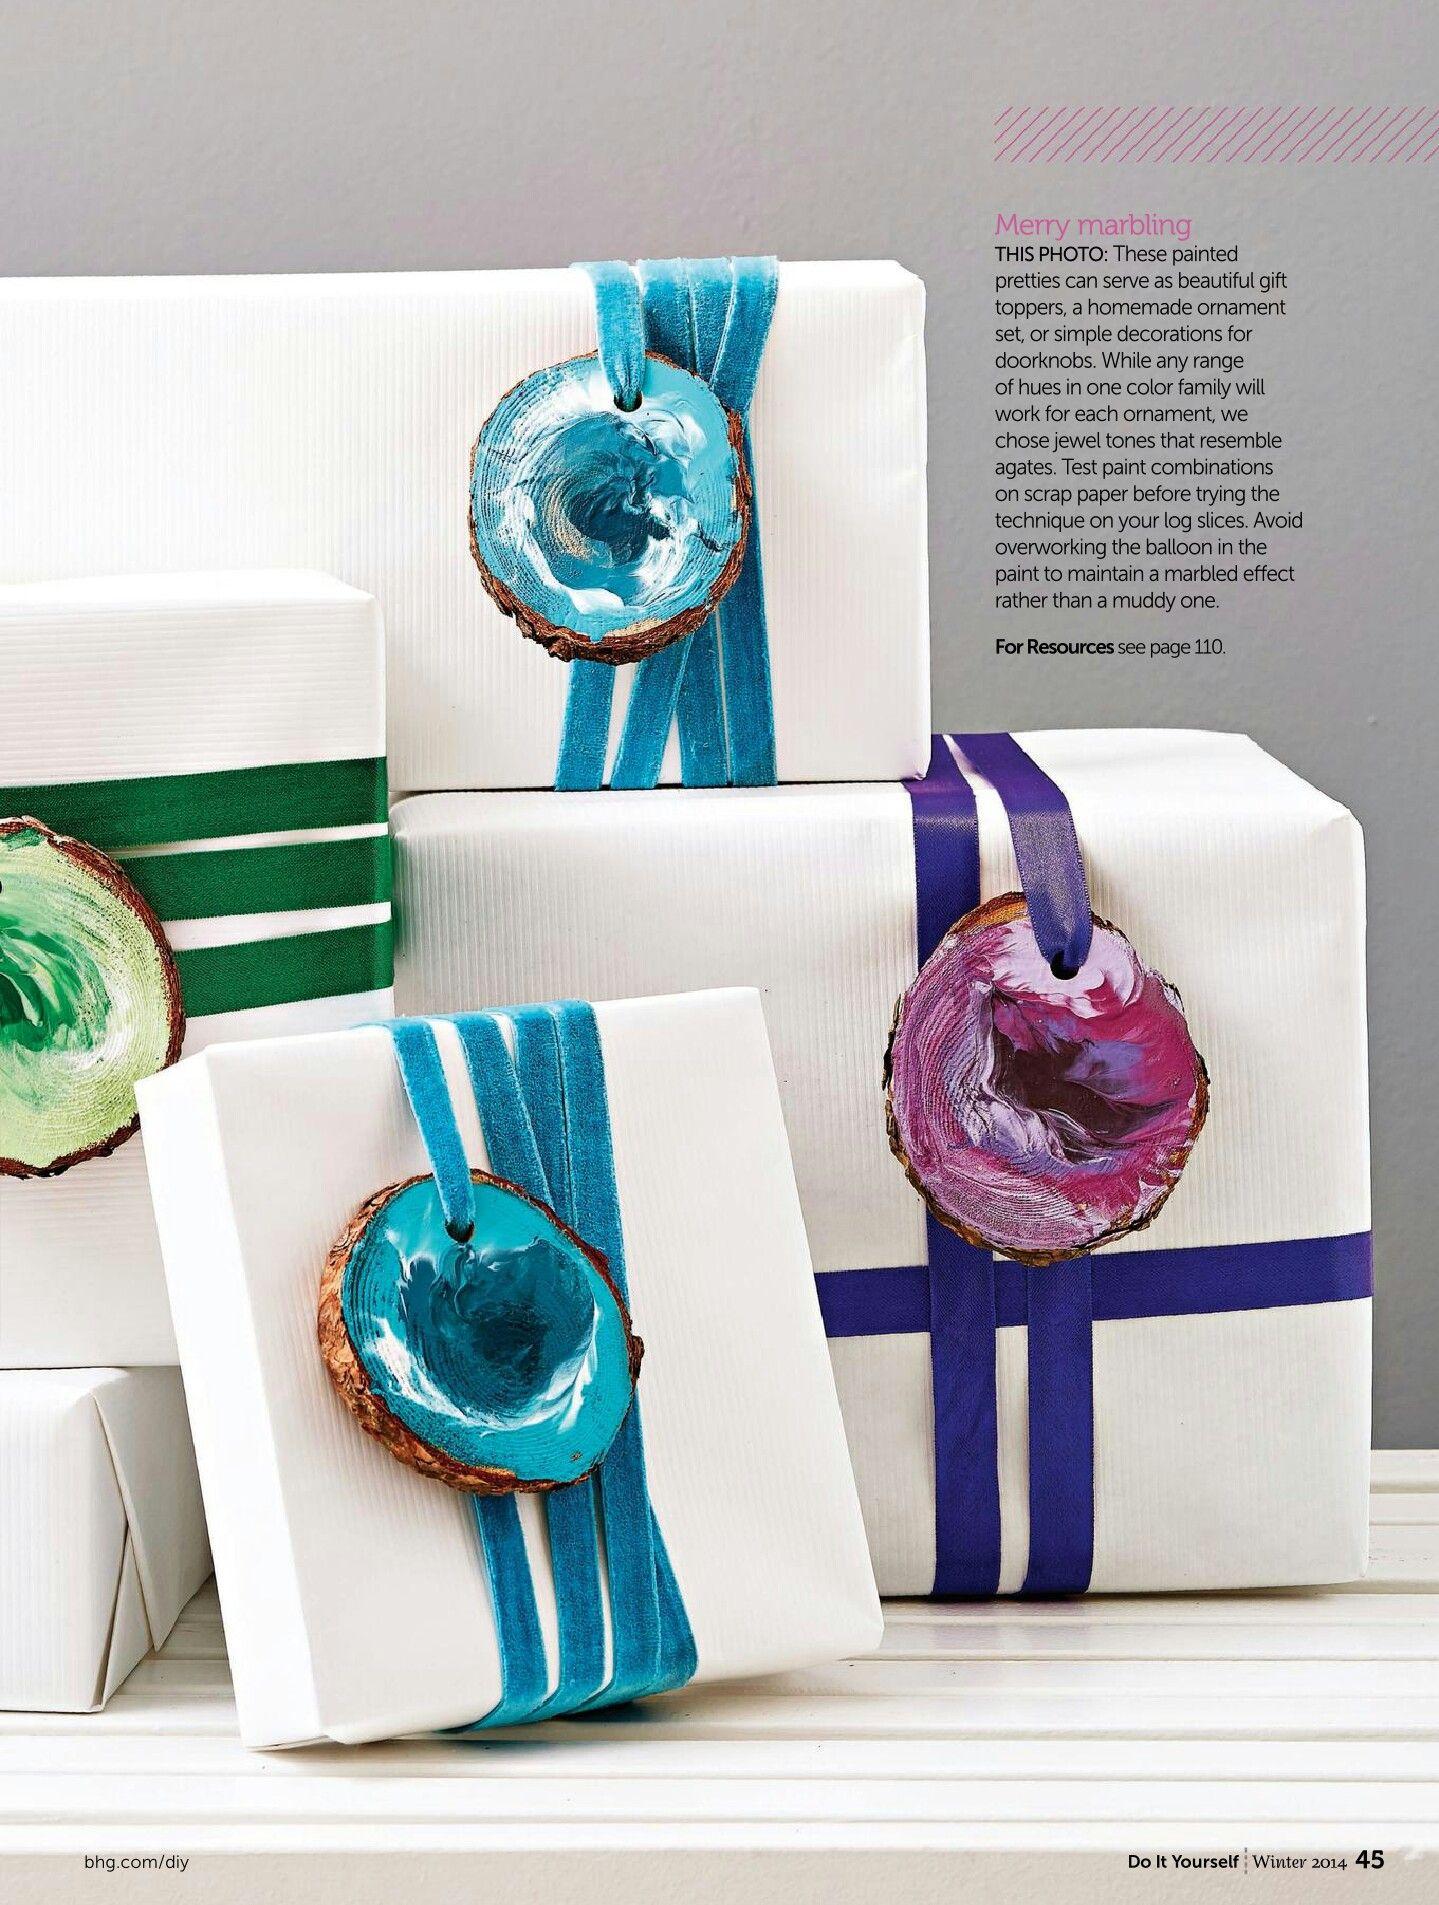 Diy marbled ornaments do it yourself magazine gift wrap boxes diy marbled ornaments do it yourself magazine solutioingenieria Gallery